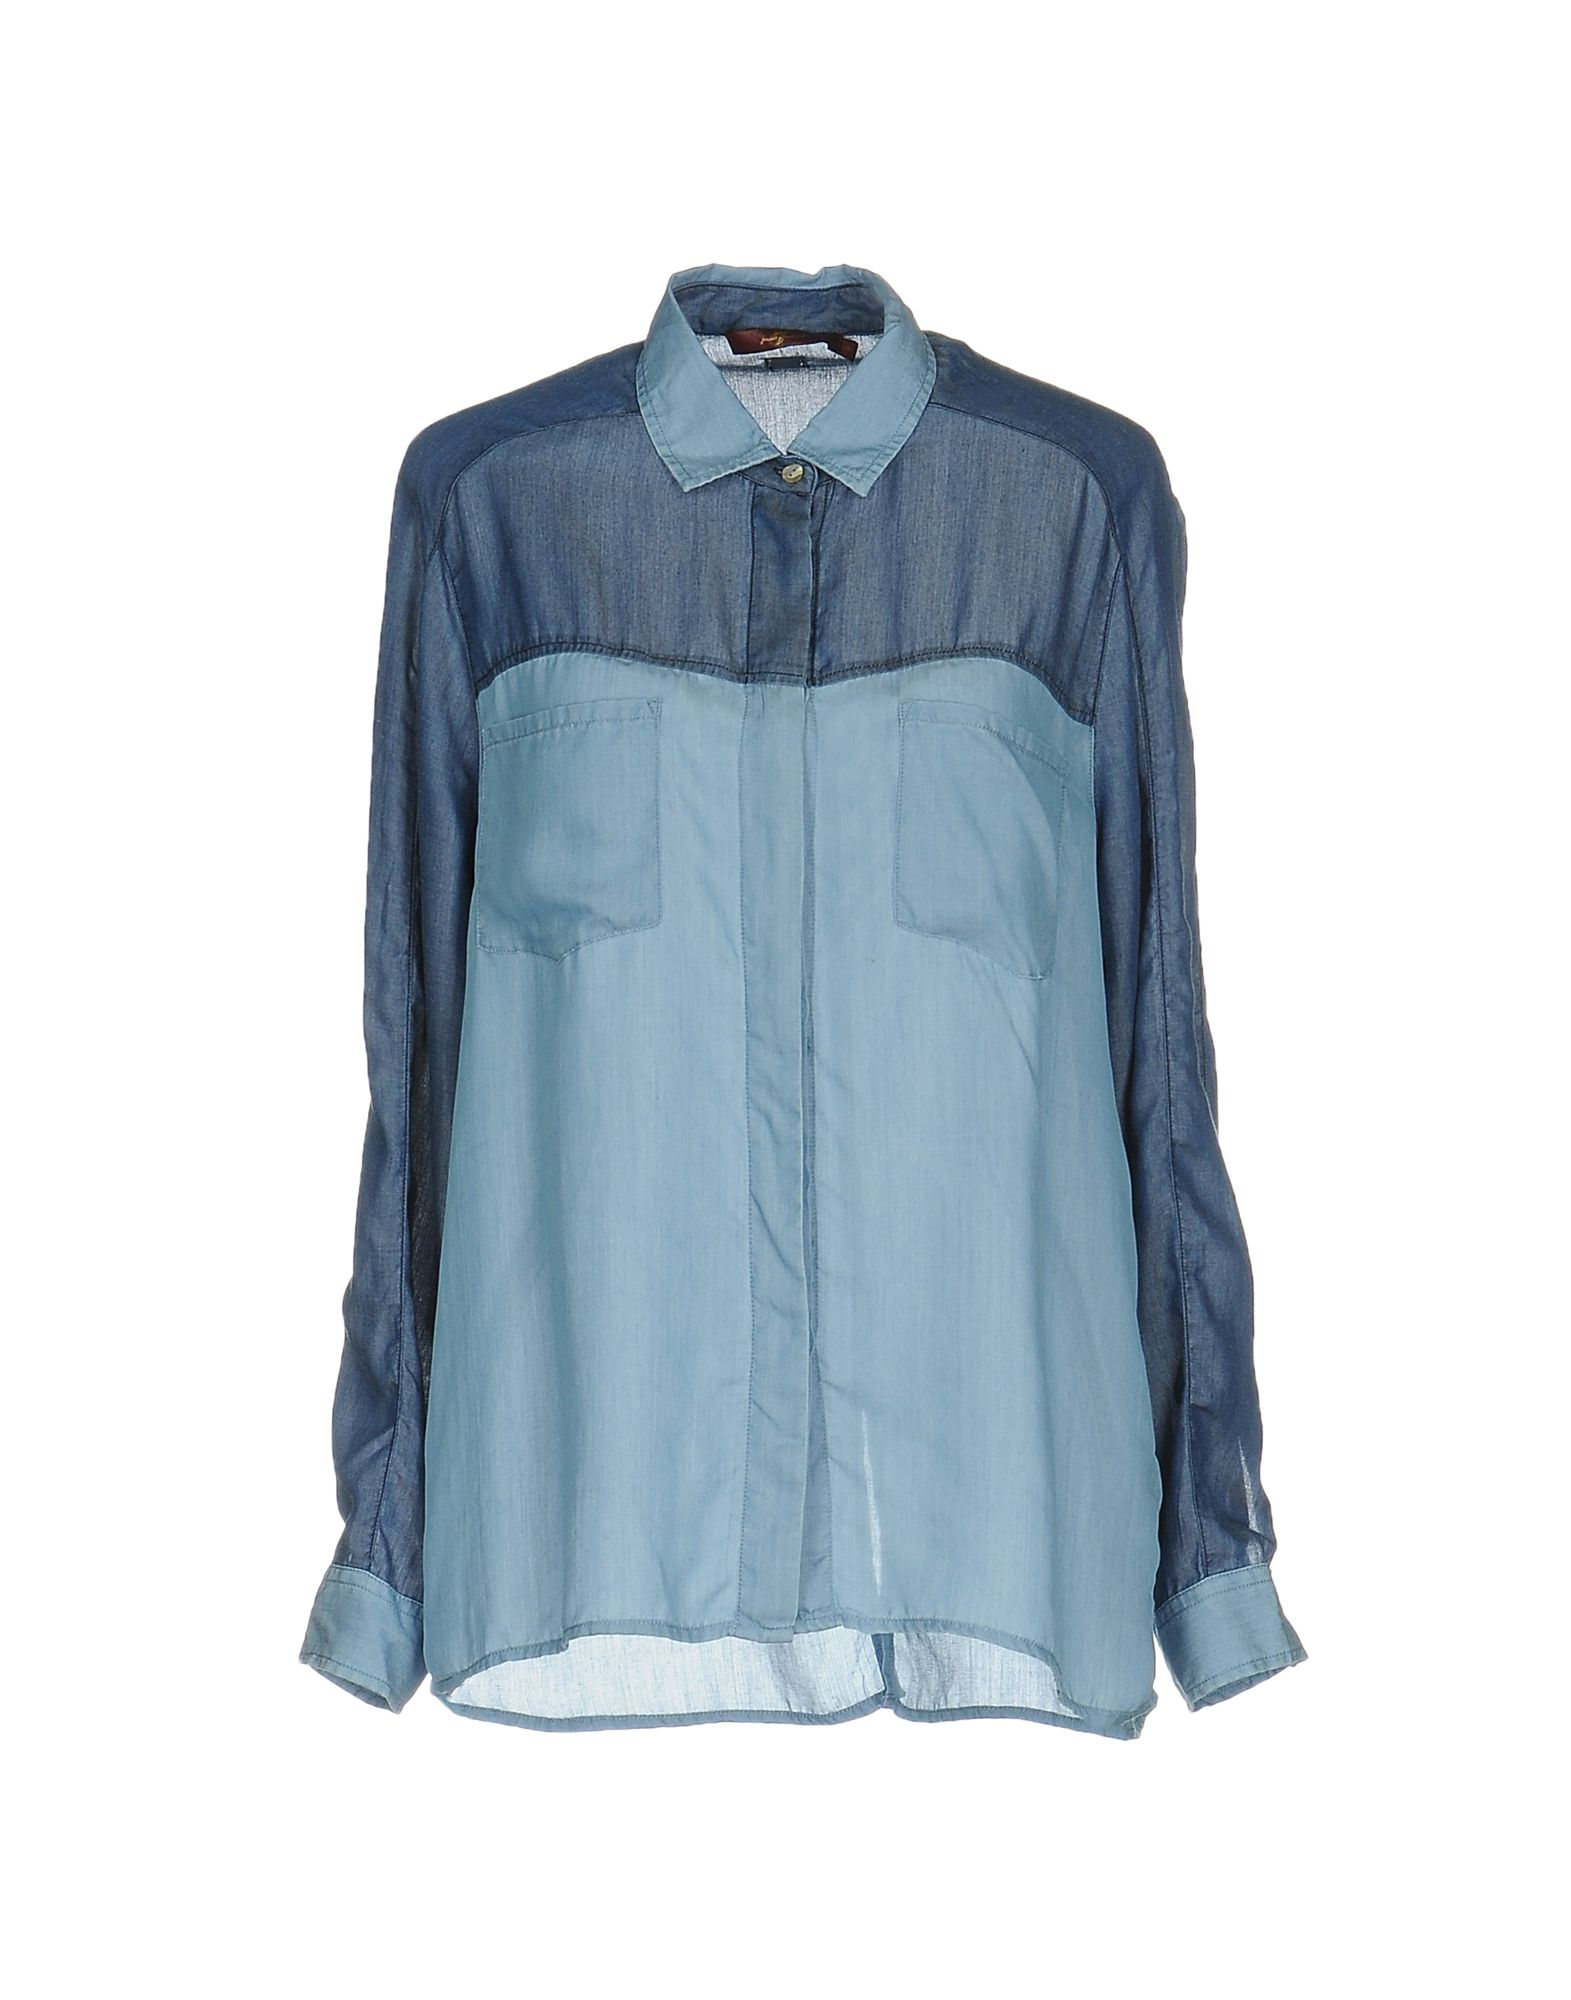 купить 7 FOR ALL MANKIND Pубашка по цене 3450 рублей